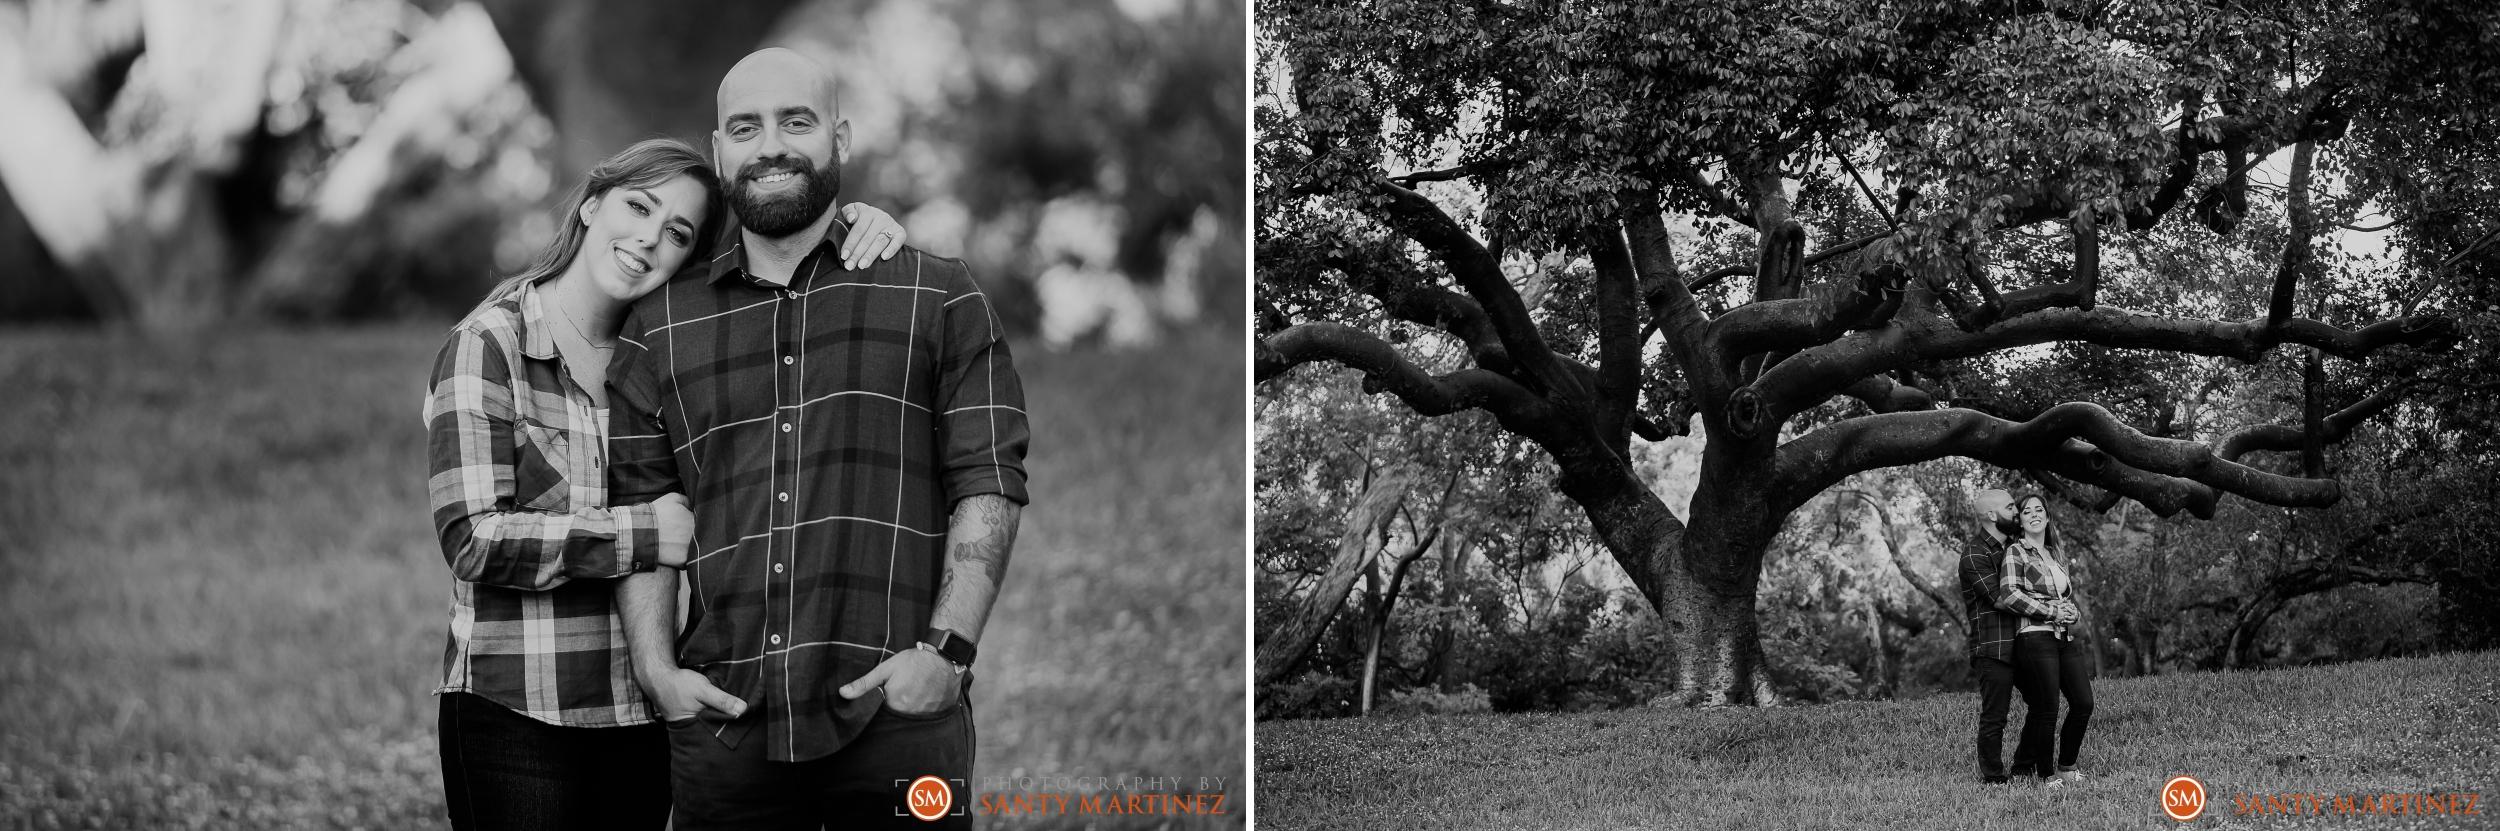 Engagement Session - Greynolds Park - Santy Martinez Photography 4.jpg